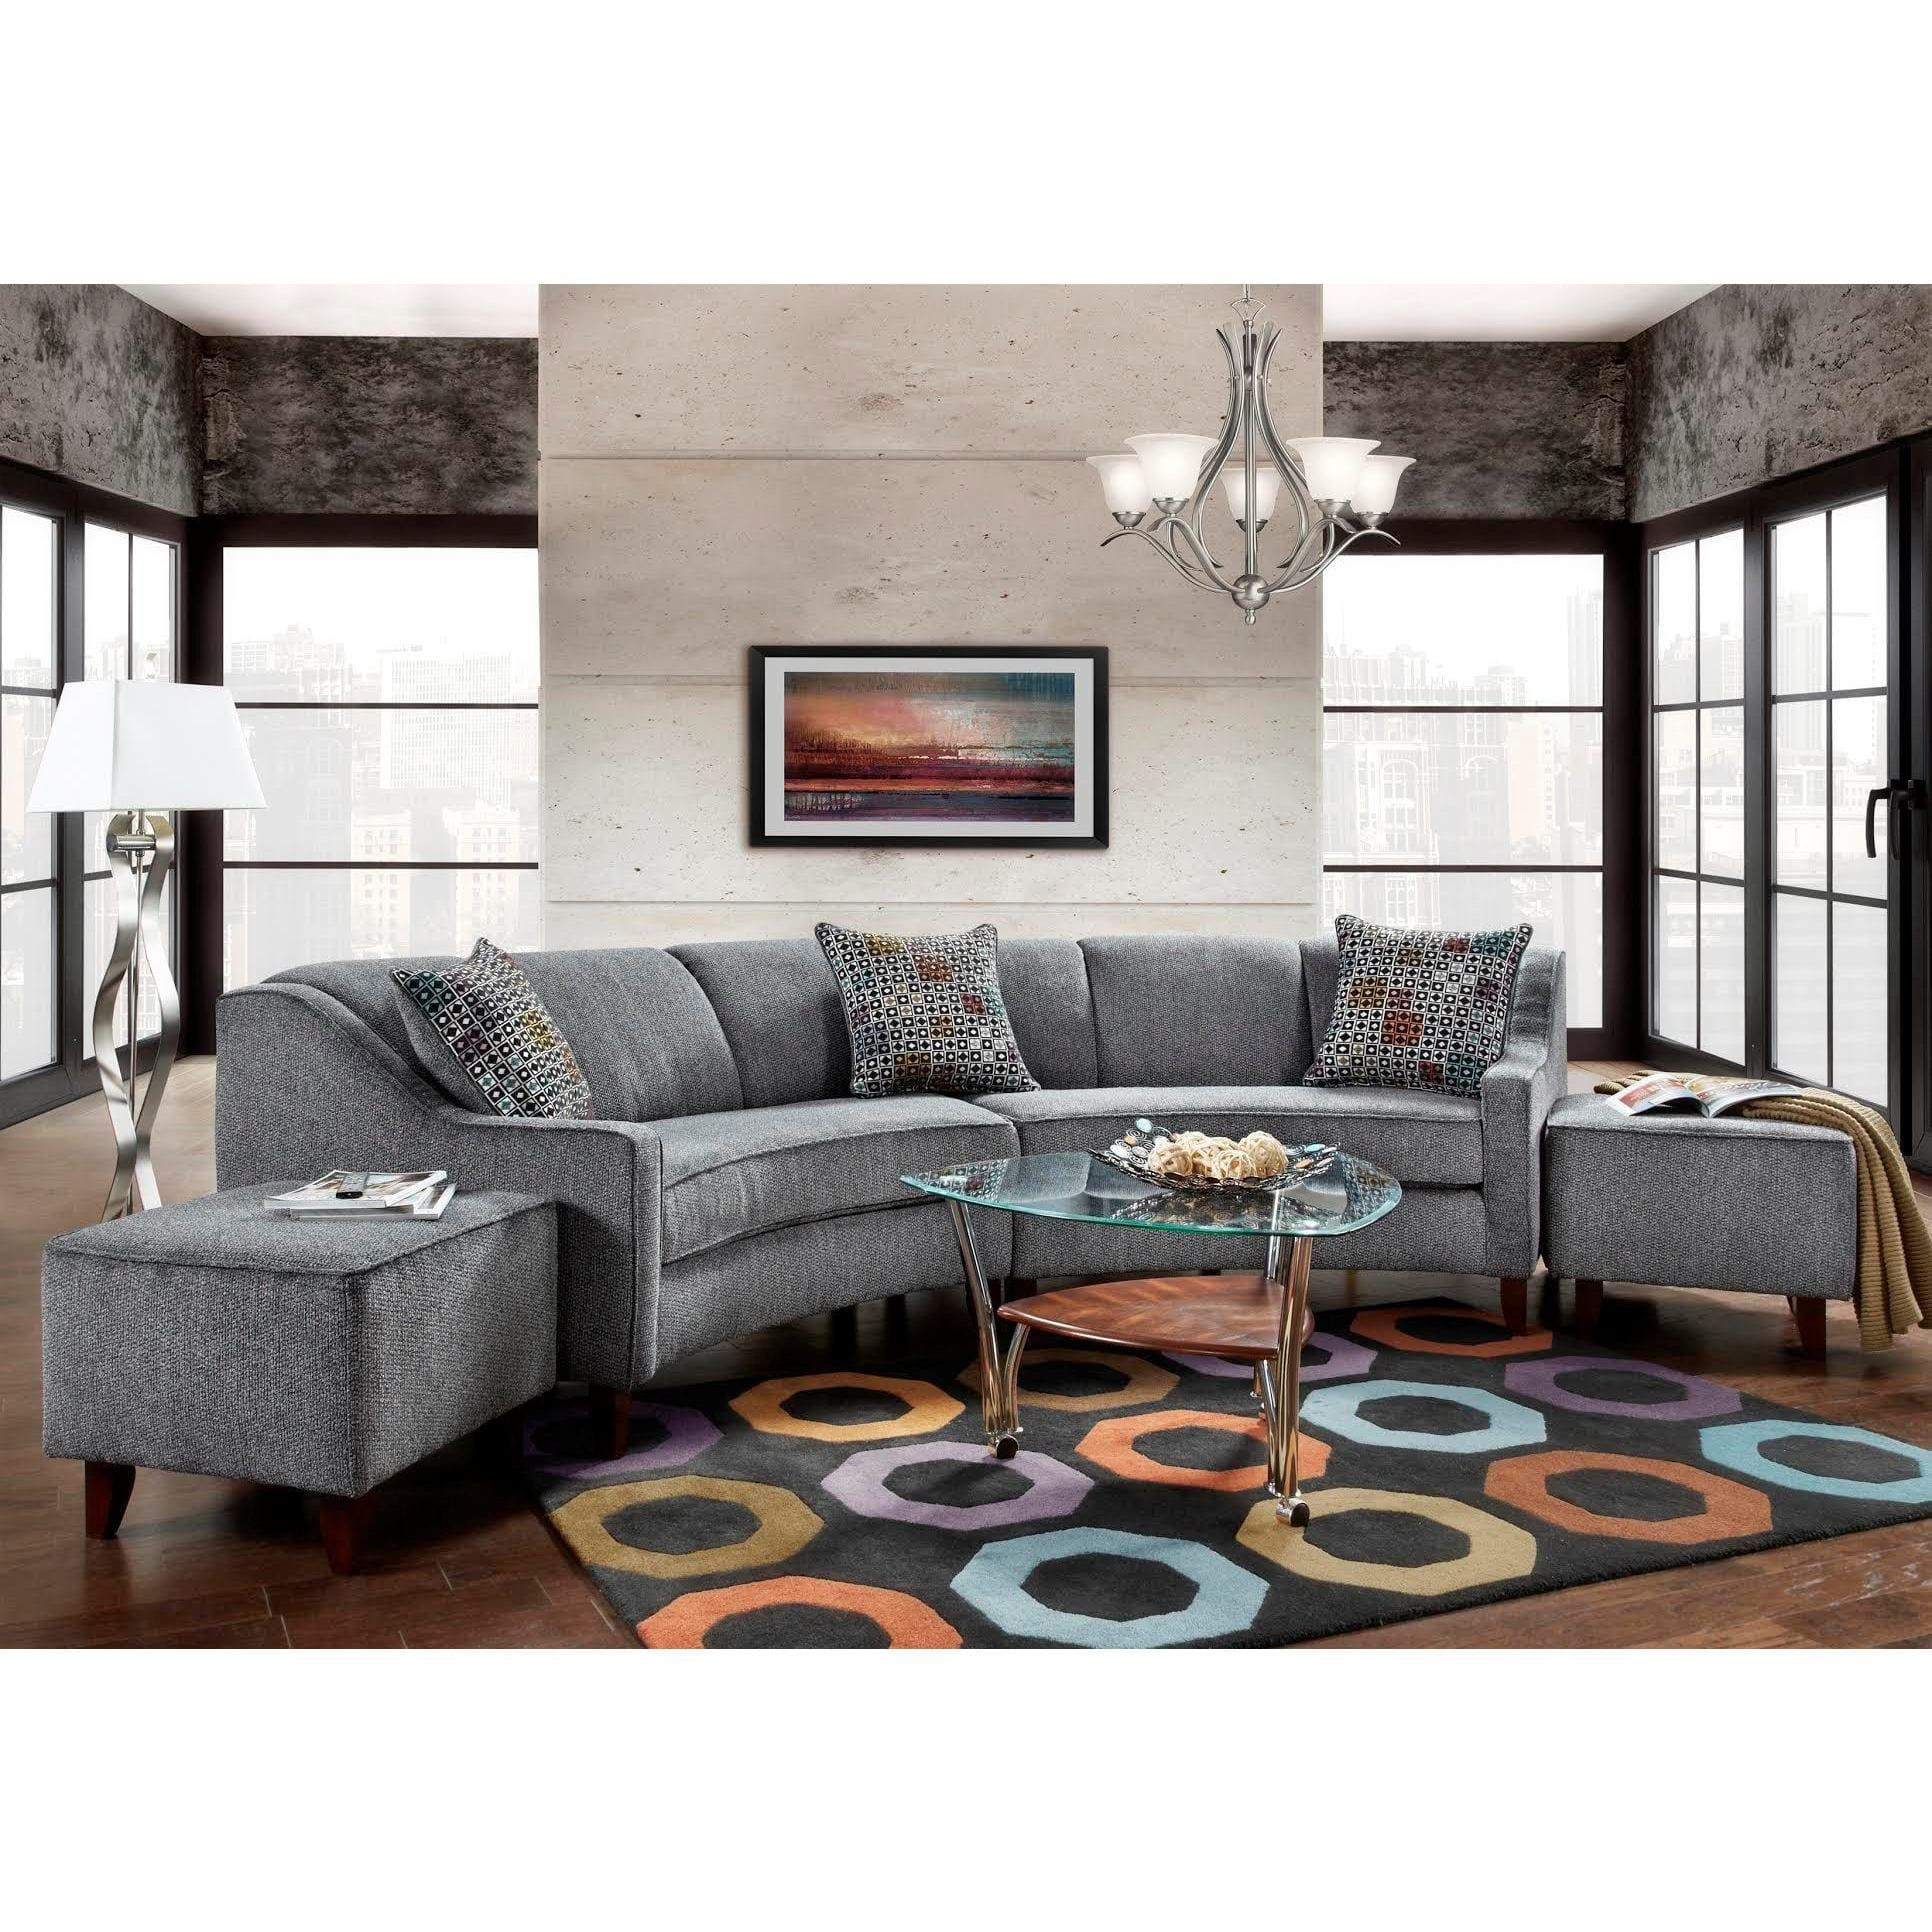 Sofa Trendz Bindel Grey Curved Sectional Sofa with Ottoman ...